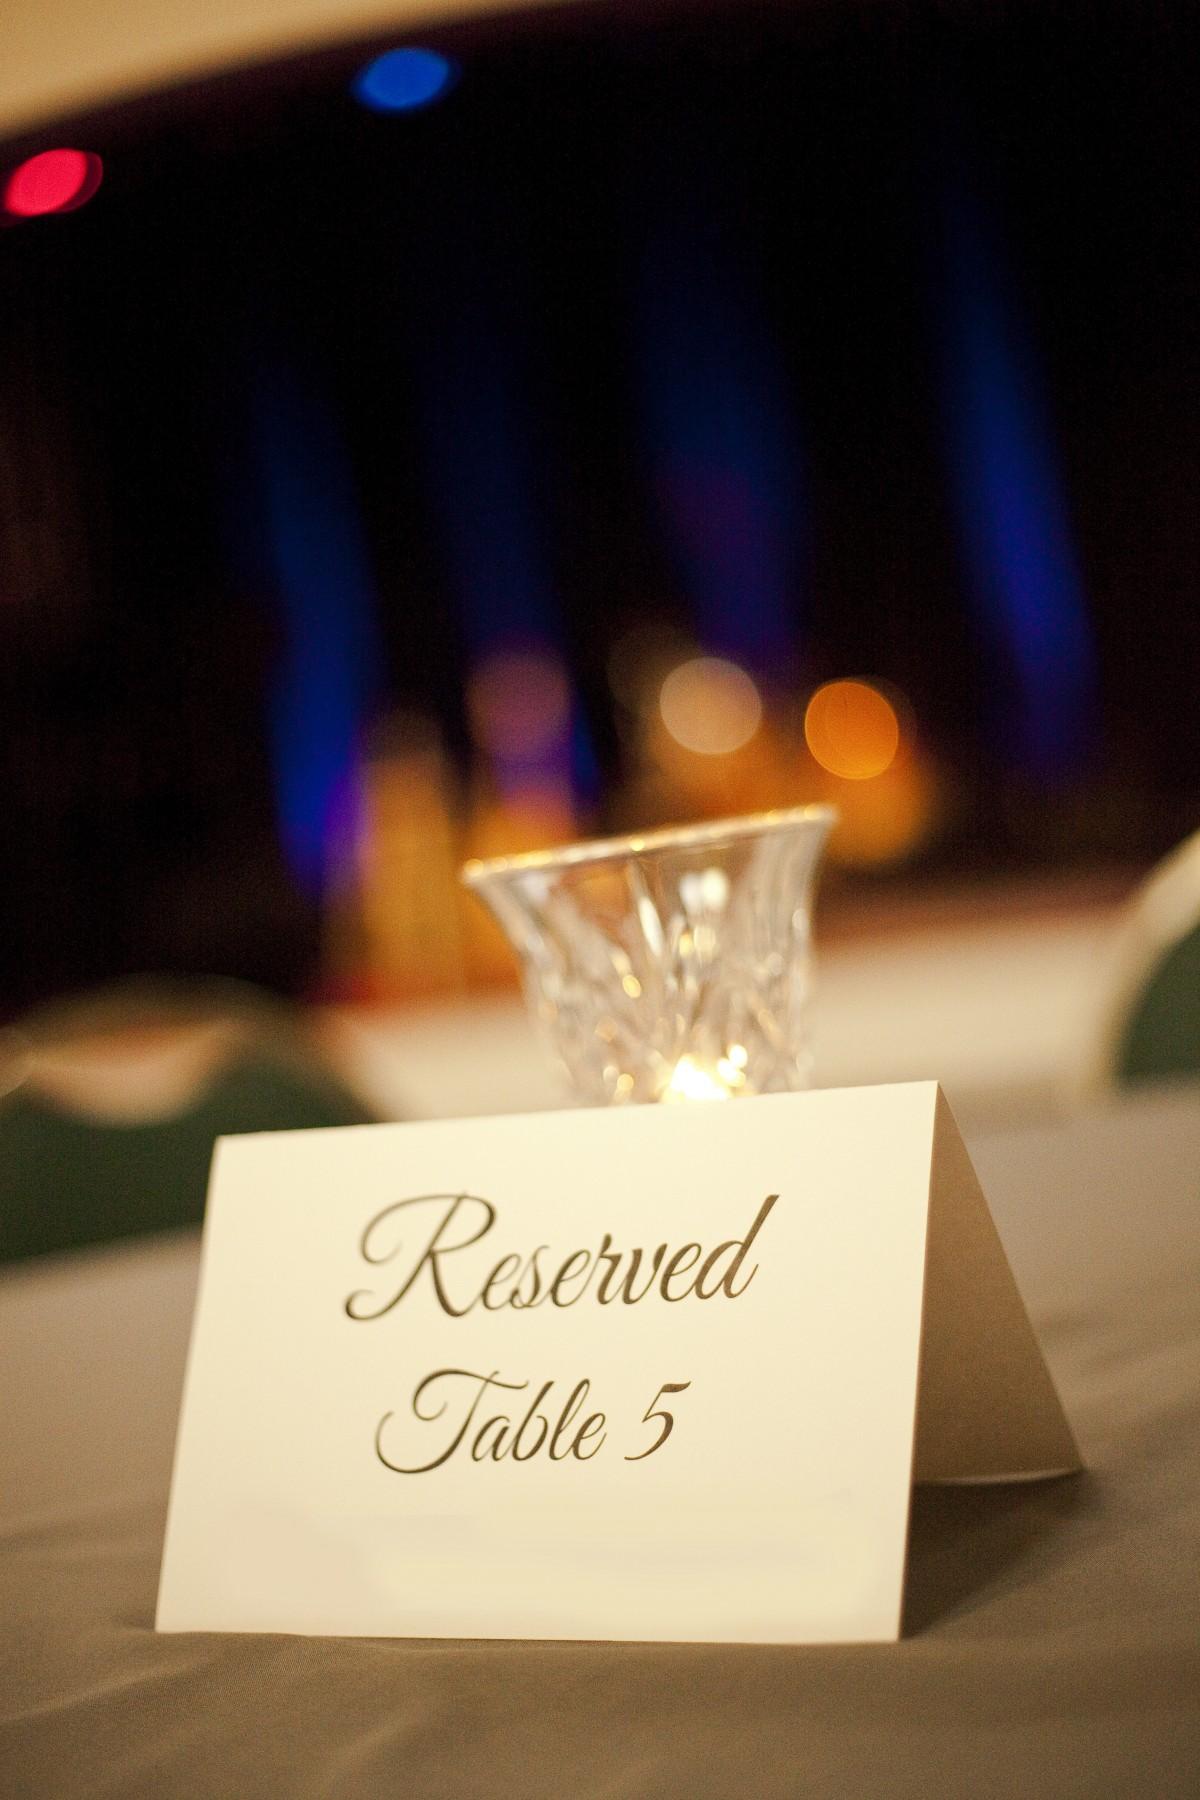 Canon Mark Ii >> Fotos gratis : mesa, restaurante, celebracion, decoración, iluminación, mantel, lujo, diseño ...